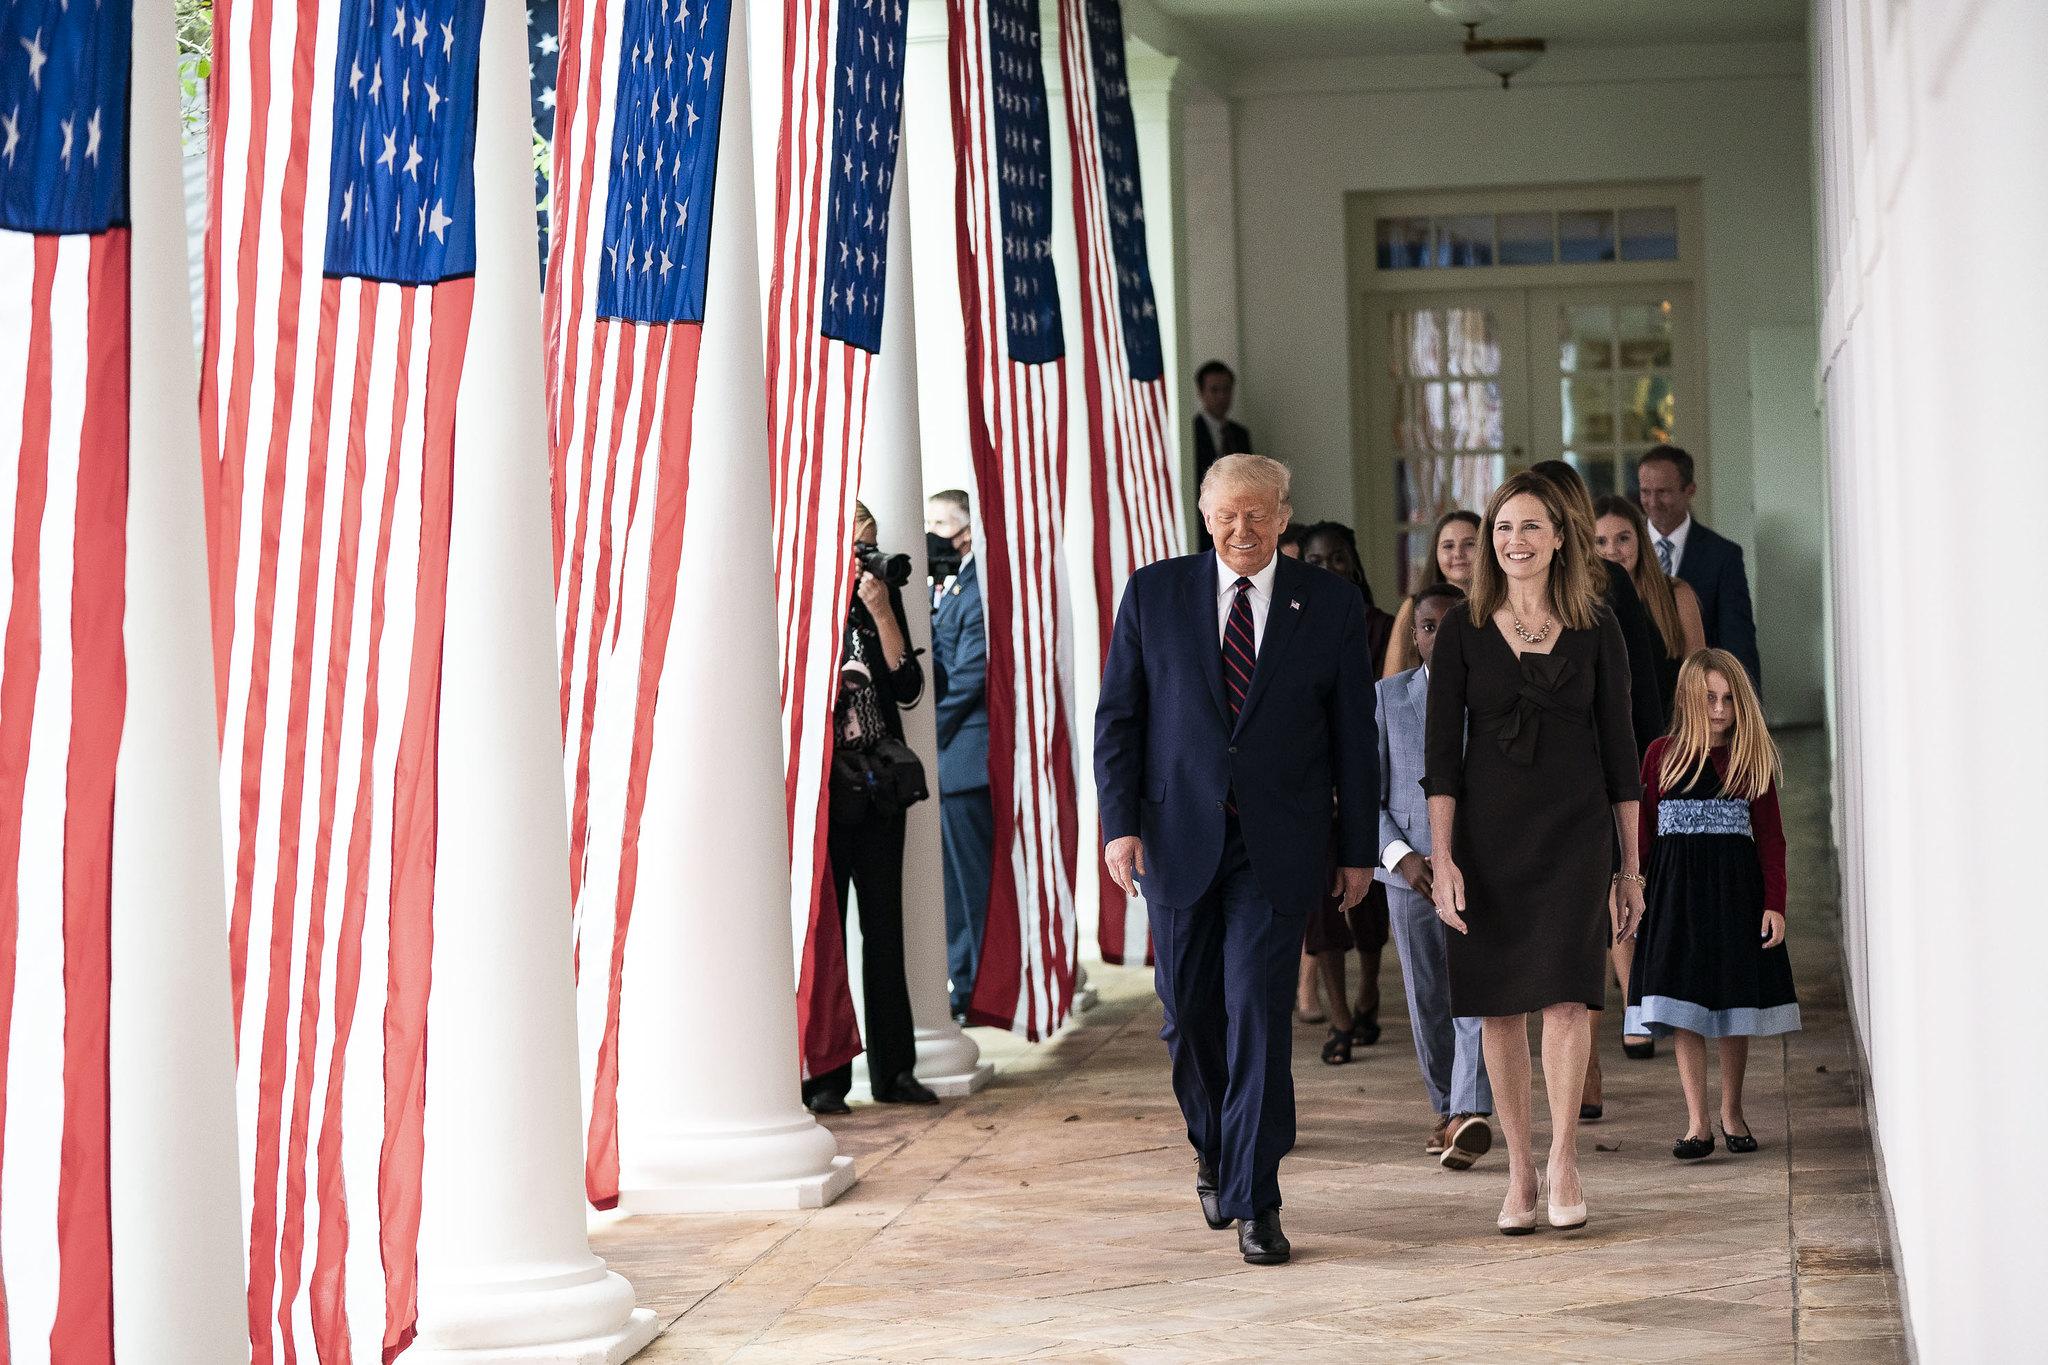 President Donald Trump and Judge Amy Coney Barrett, the president's Supreme Court nominee, Sept. 26, 2020. (White House, Shealah Craighead)